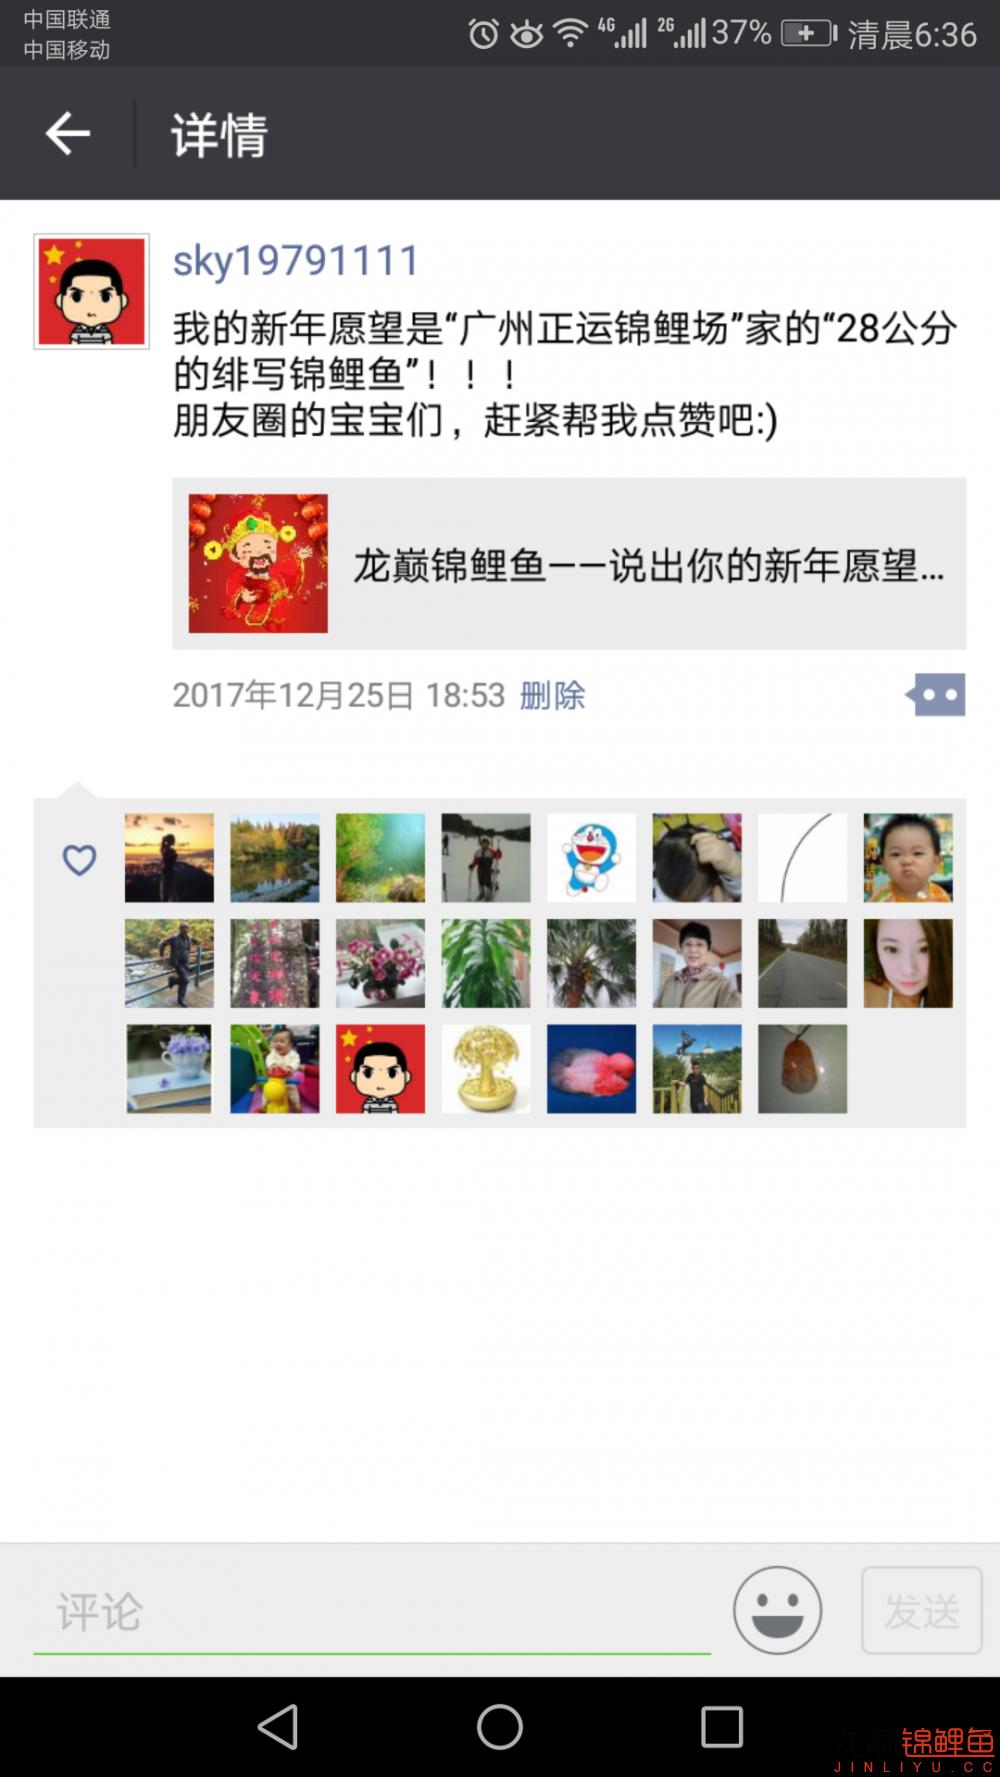 Screenshot_20171229-063611.png